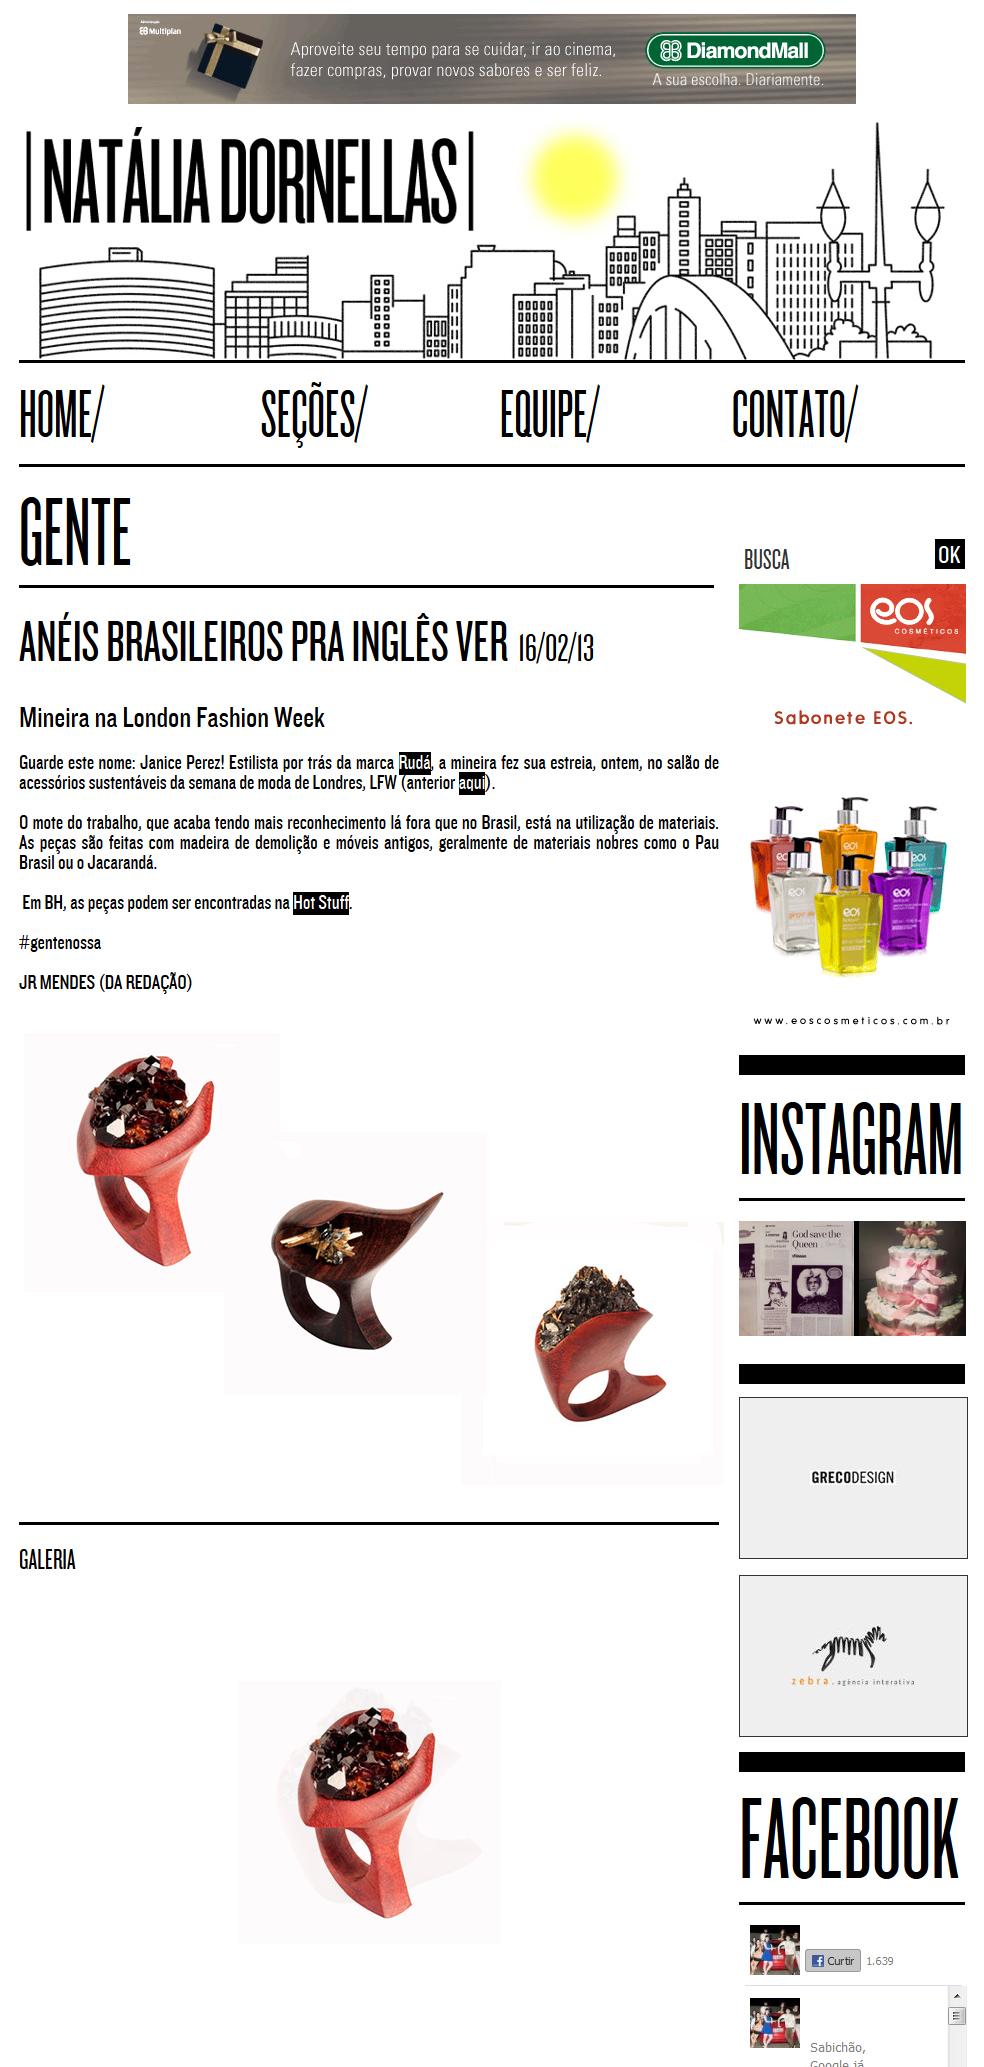 ANÉIS+BRASILEIROS+PRA+INGLÊS+VER+-+Gente+-+Natália+Dornellas_20130224_071618+cópia